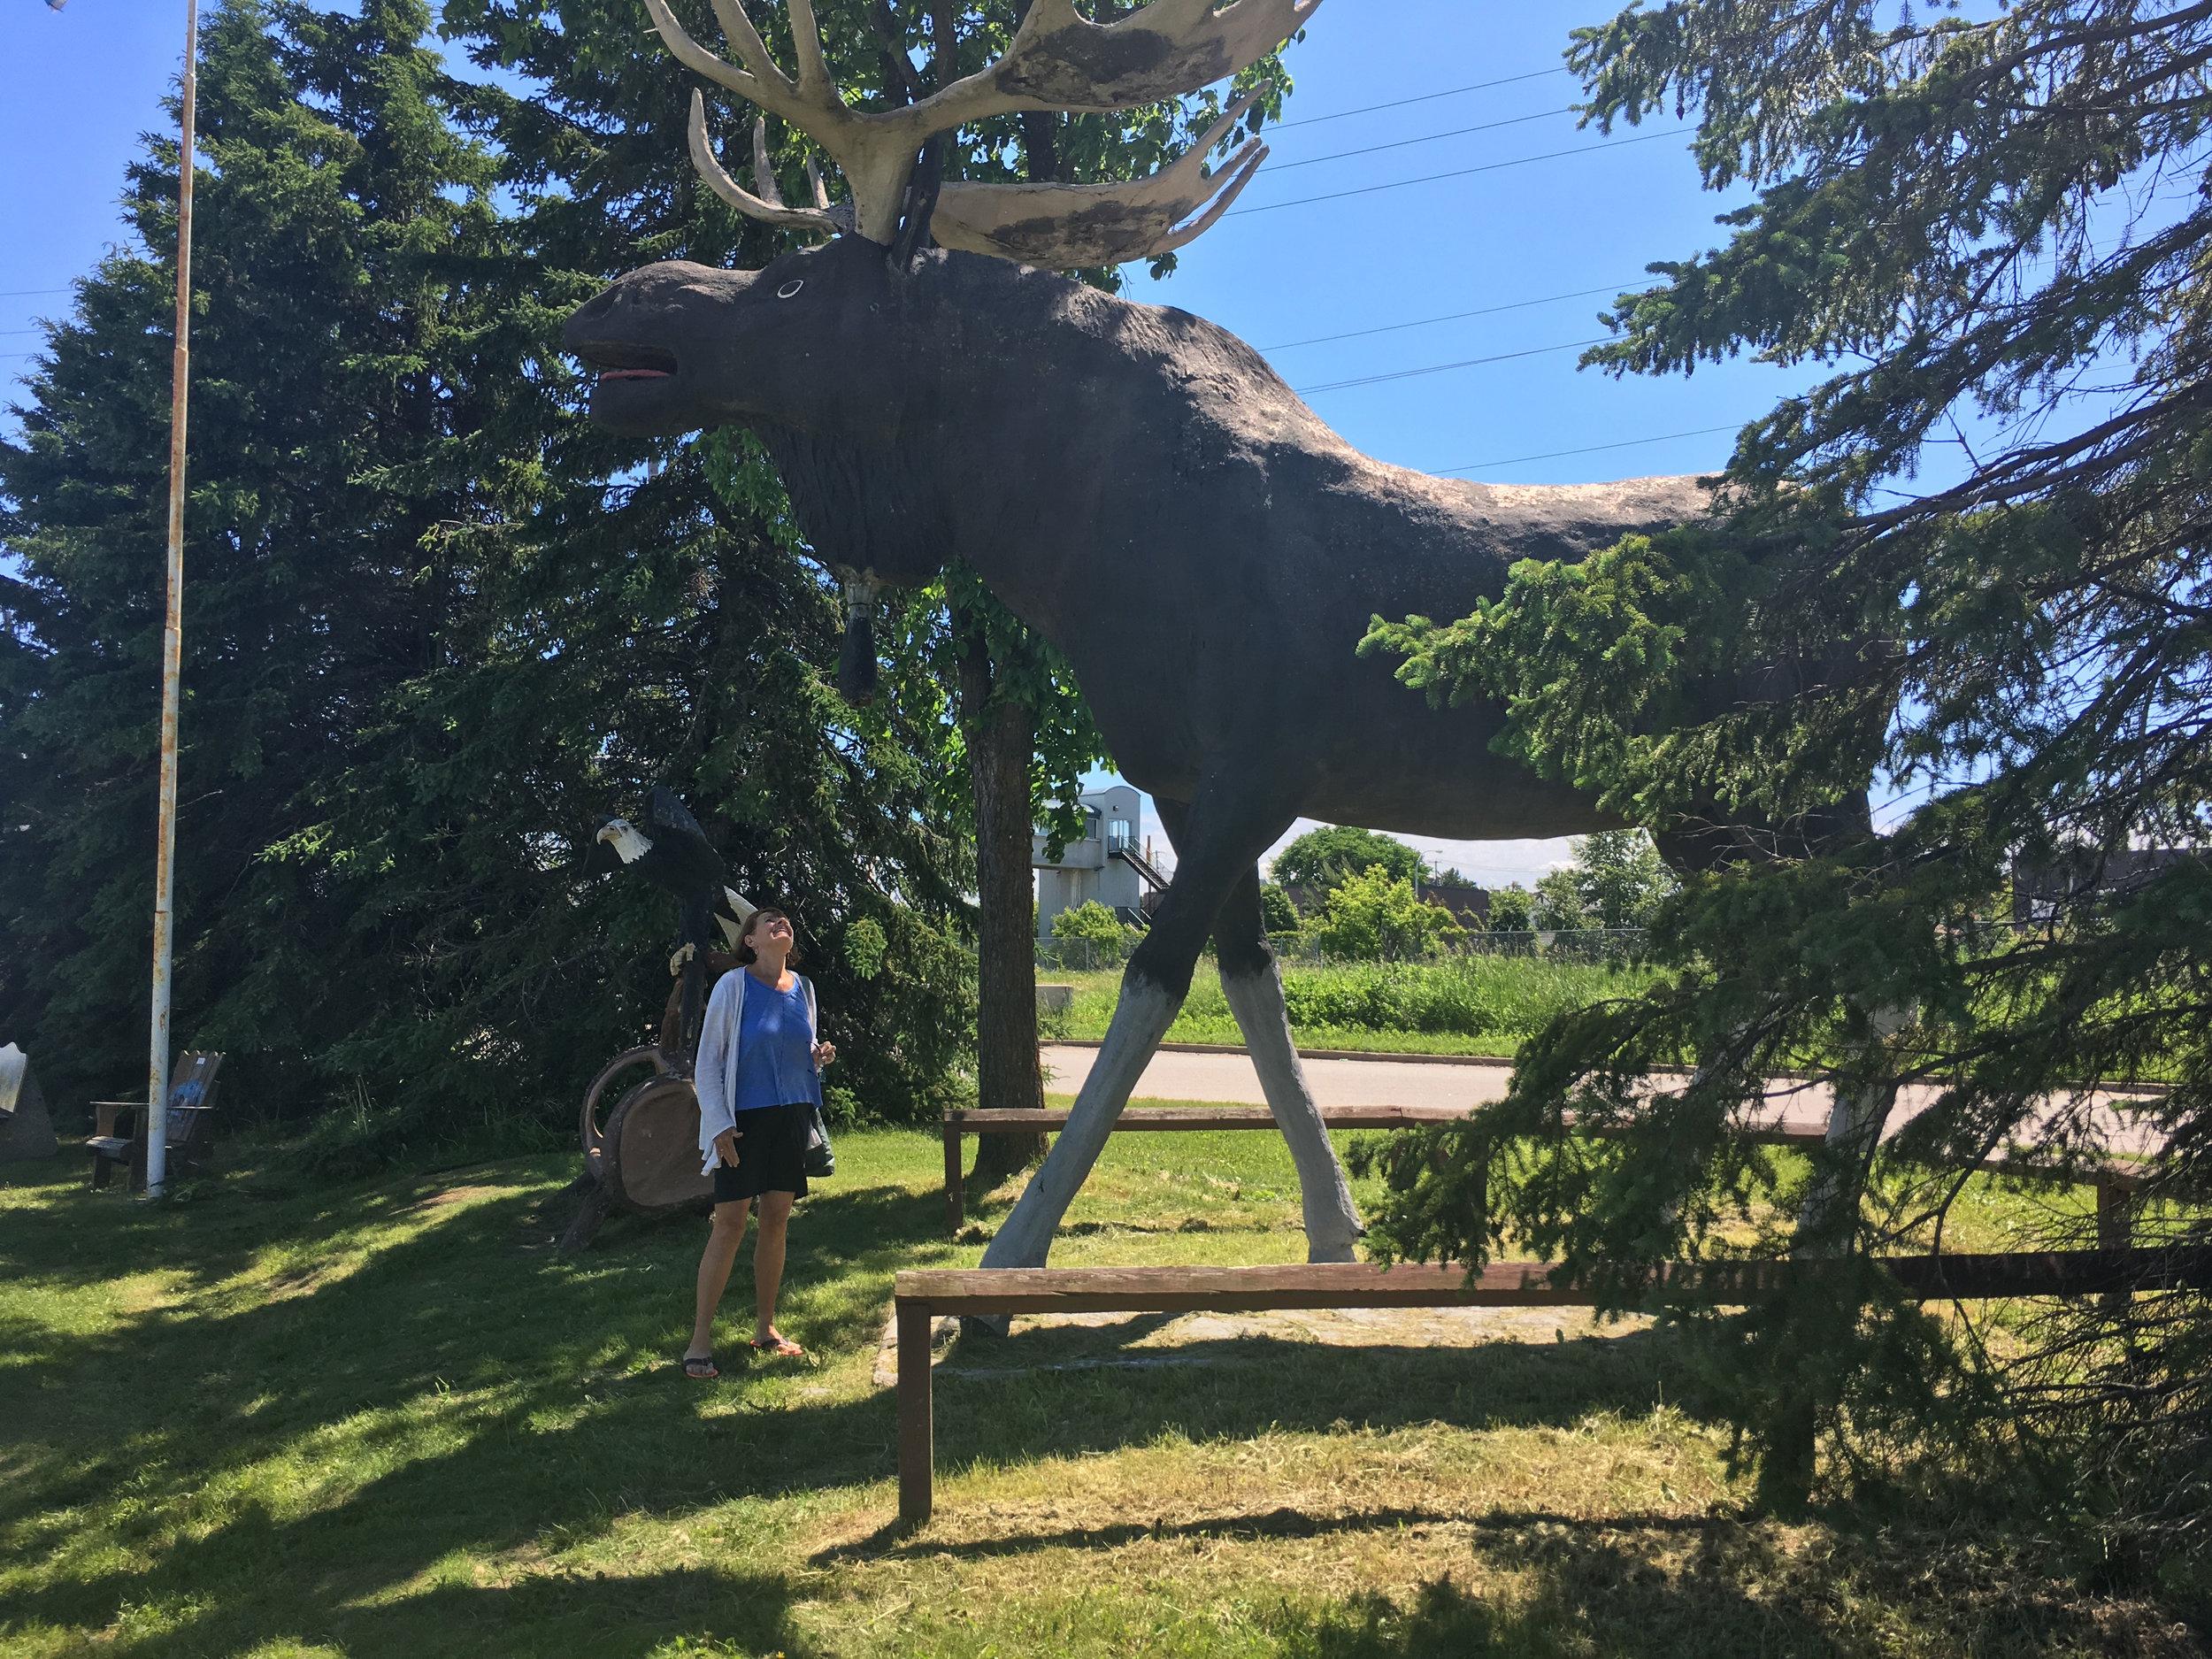 Roadside Moose!